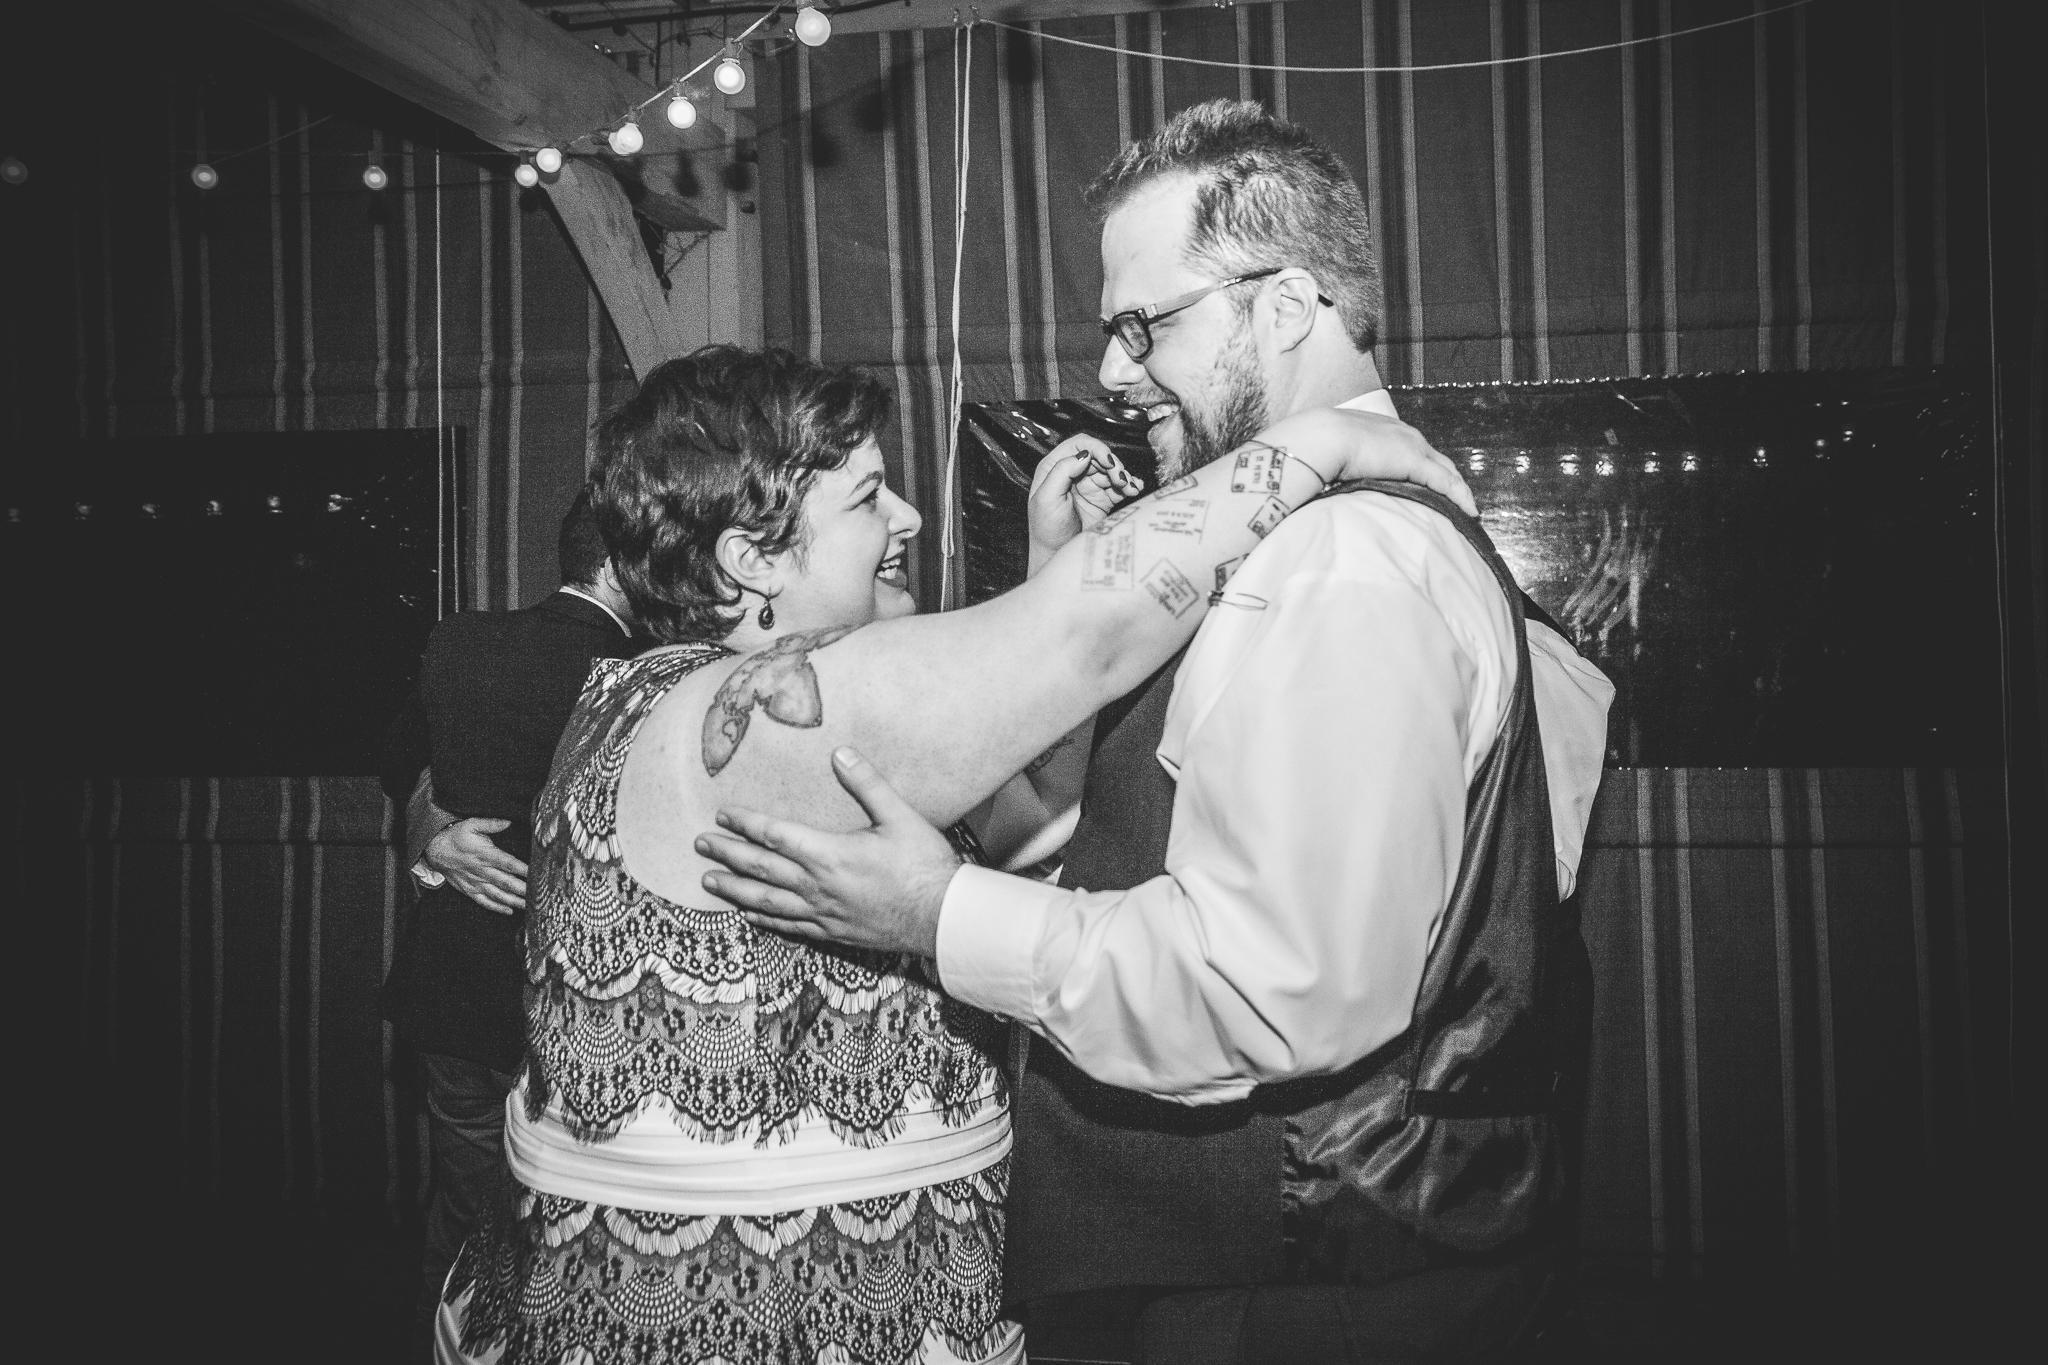 camuglia-whomstudio-chelsea_and_andy-nycphotographer-wedding-brooklyn-buffalo-timberlodge-181-1264.jpg